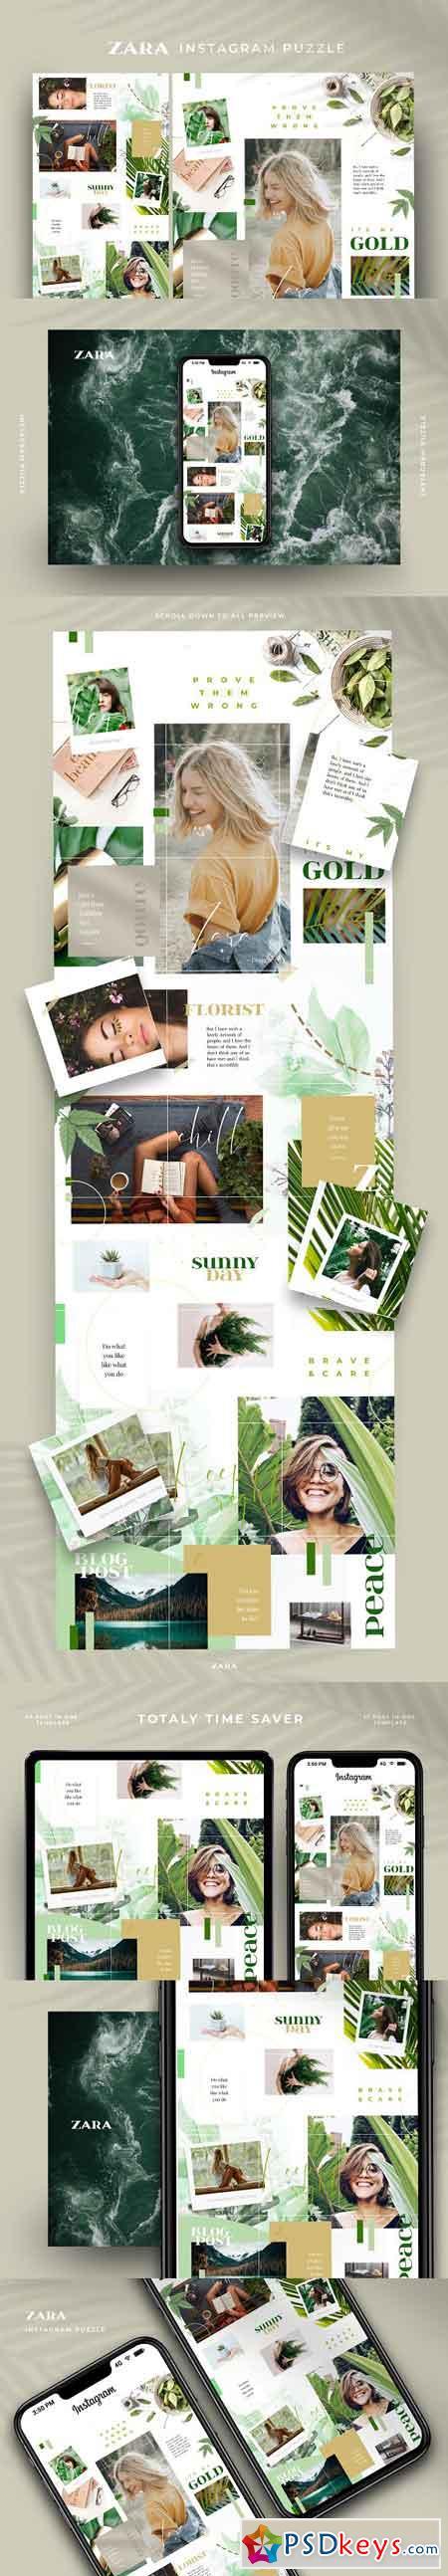 Zara - Instagram puzzle 3210664